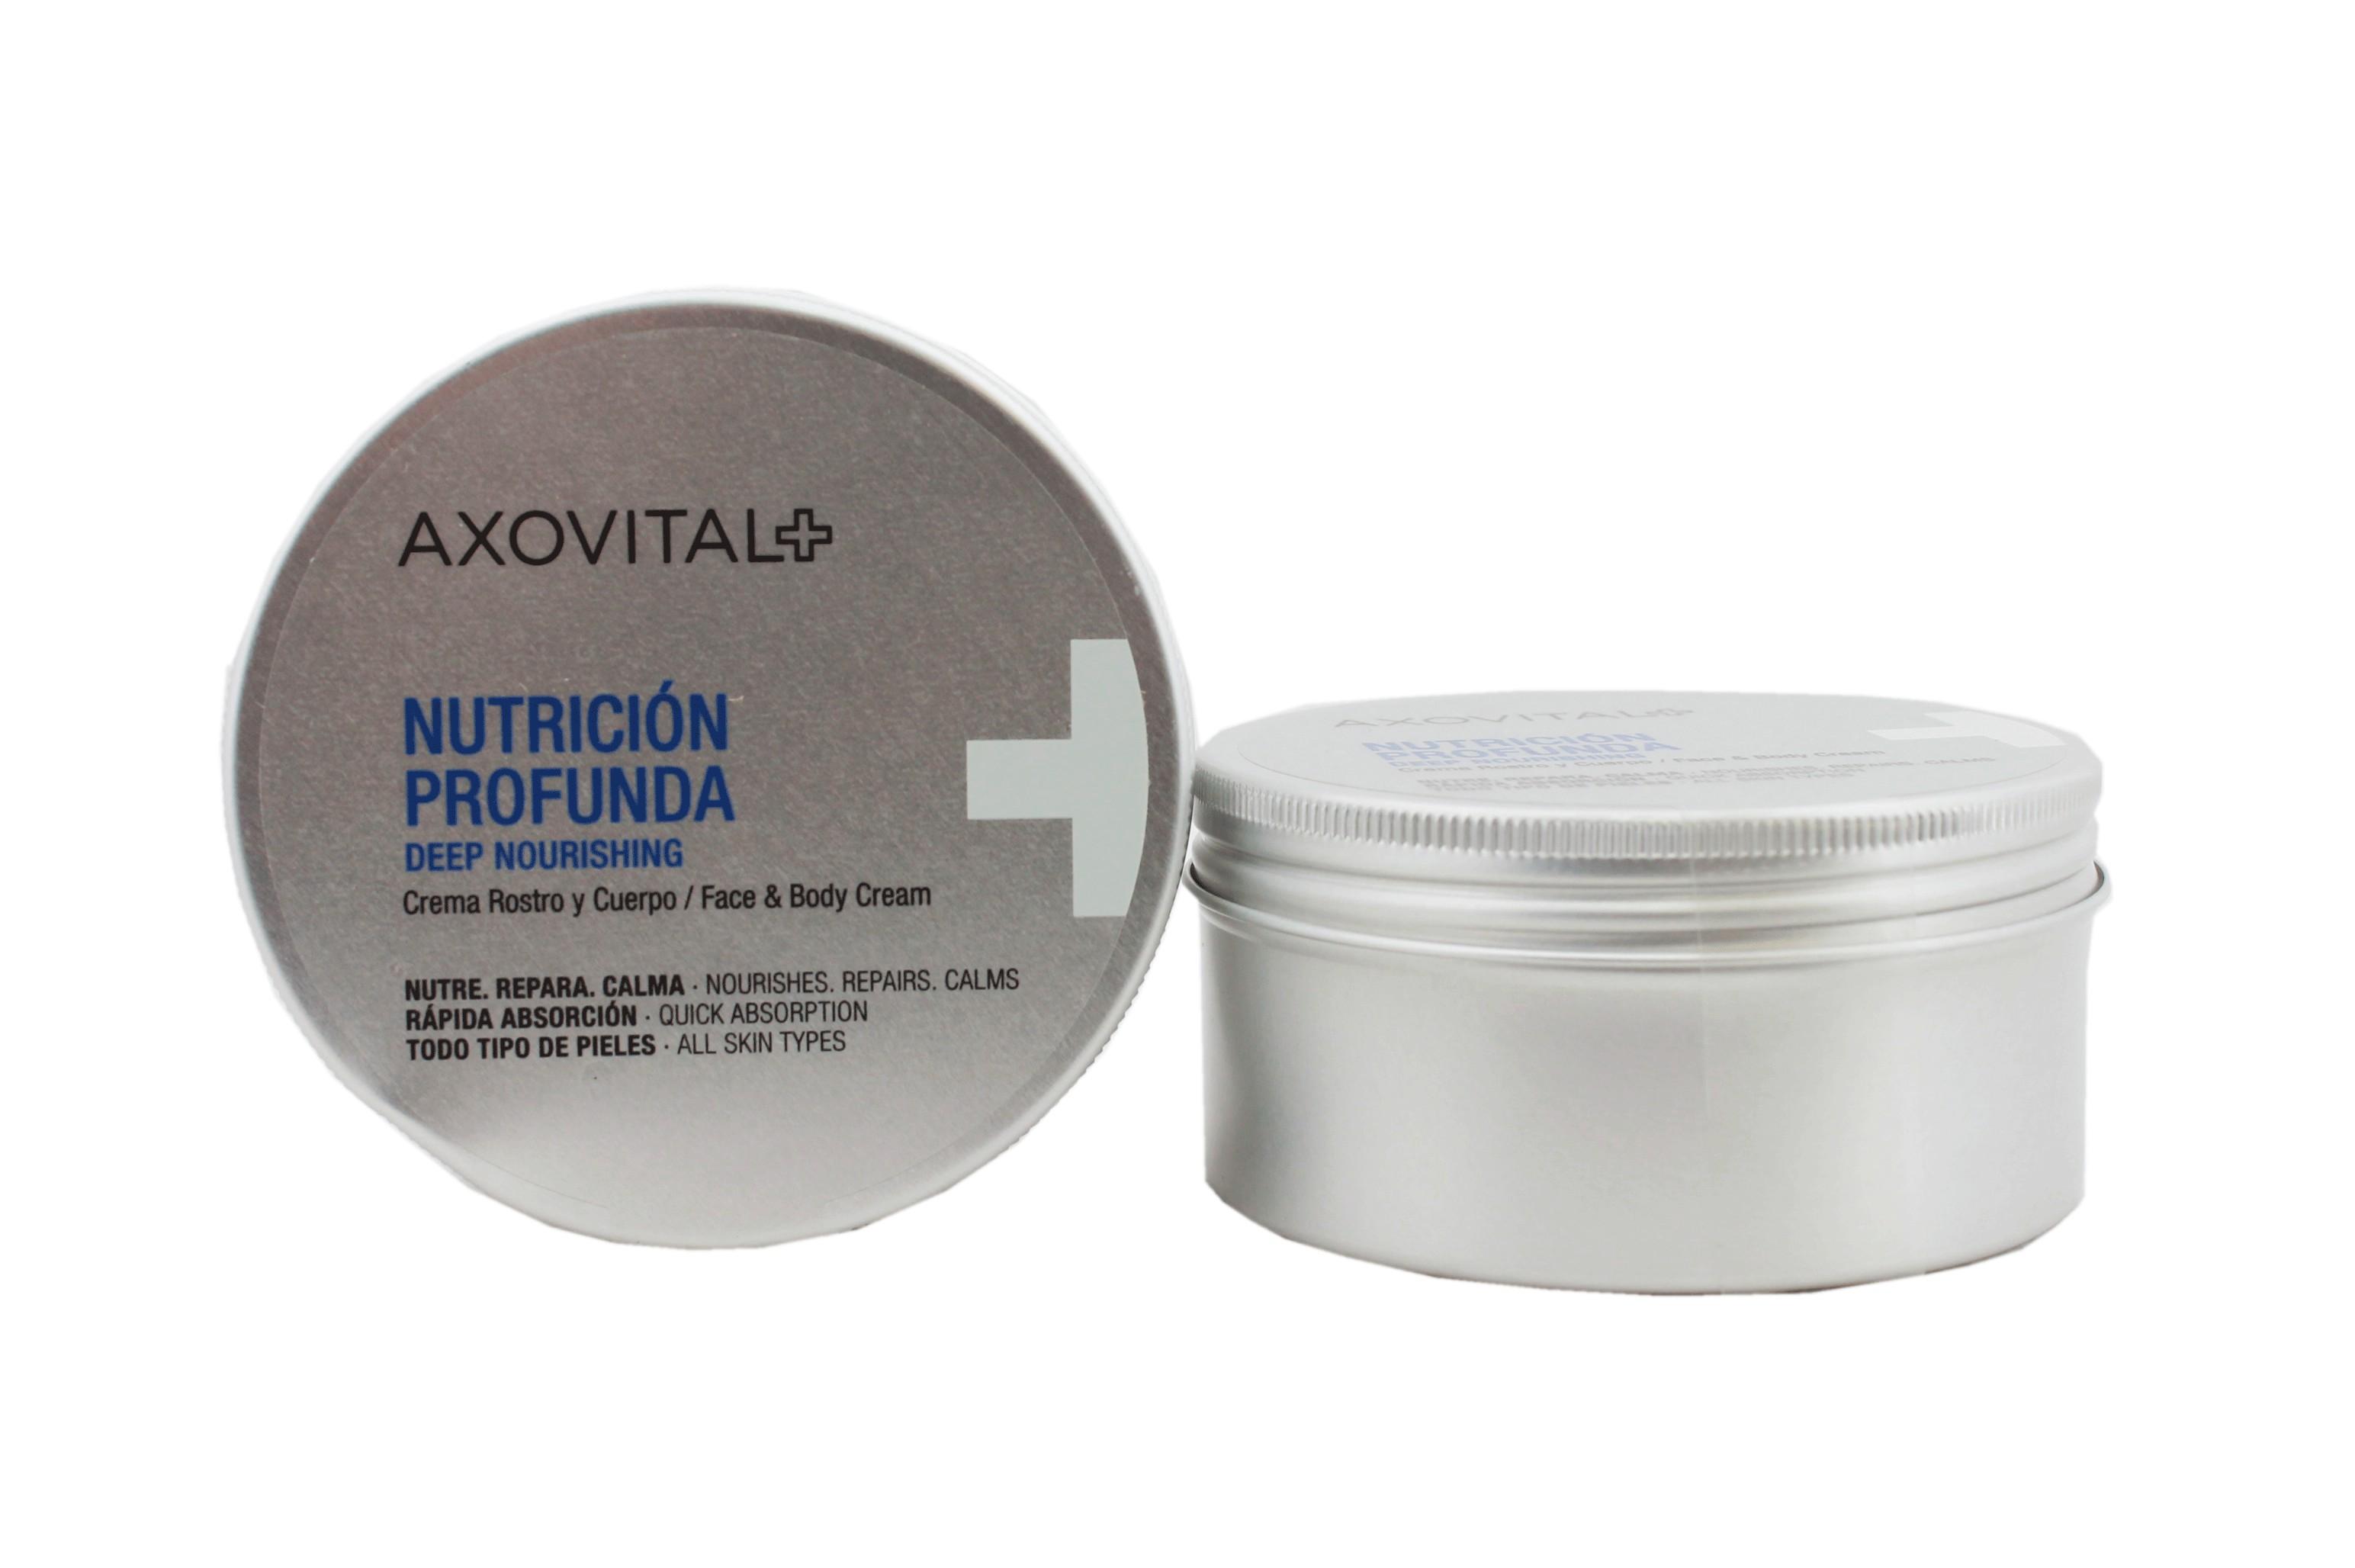 e459d75ff Axovital Nutricion Profunda Crema Rostro y Cuerpo 250ml - Farmacia GT